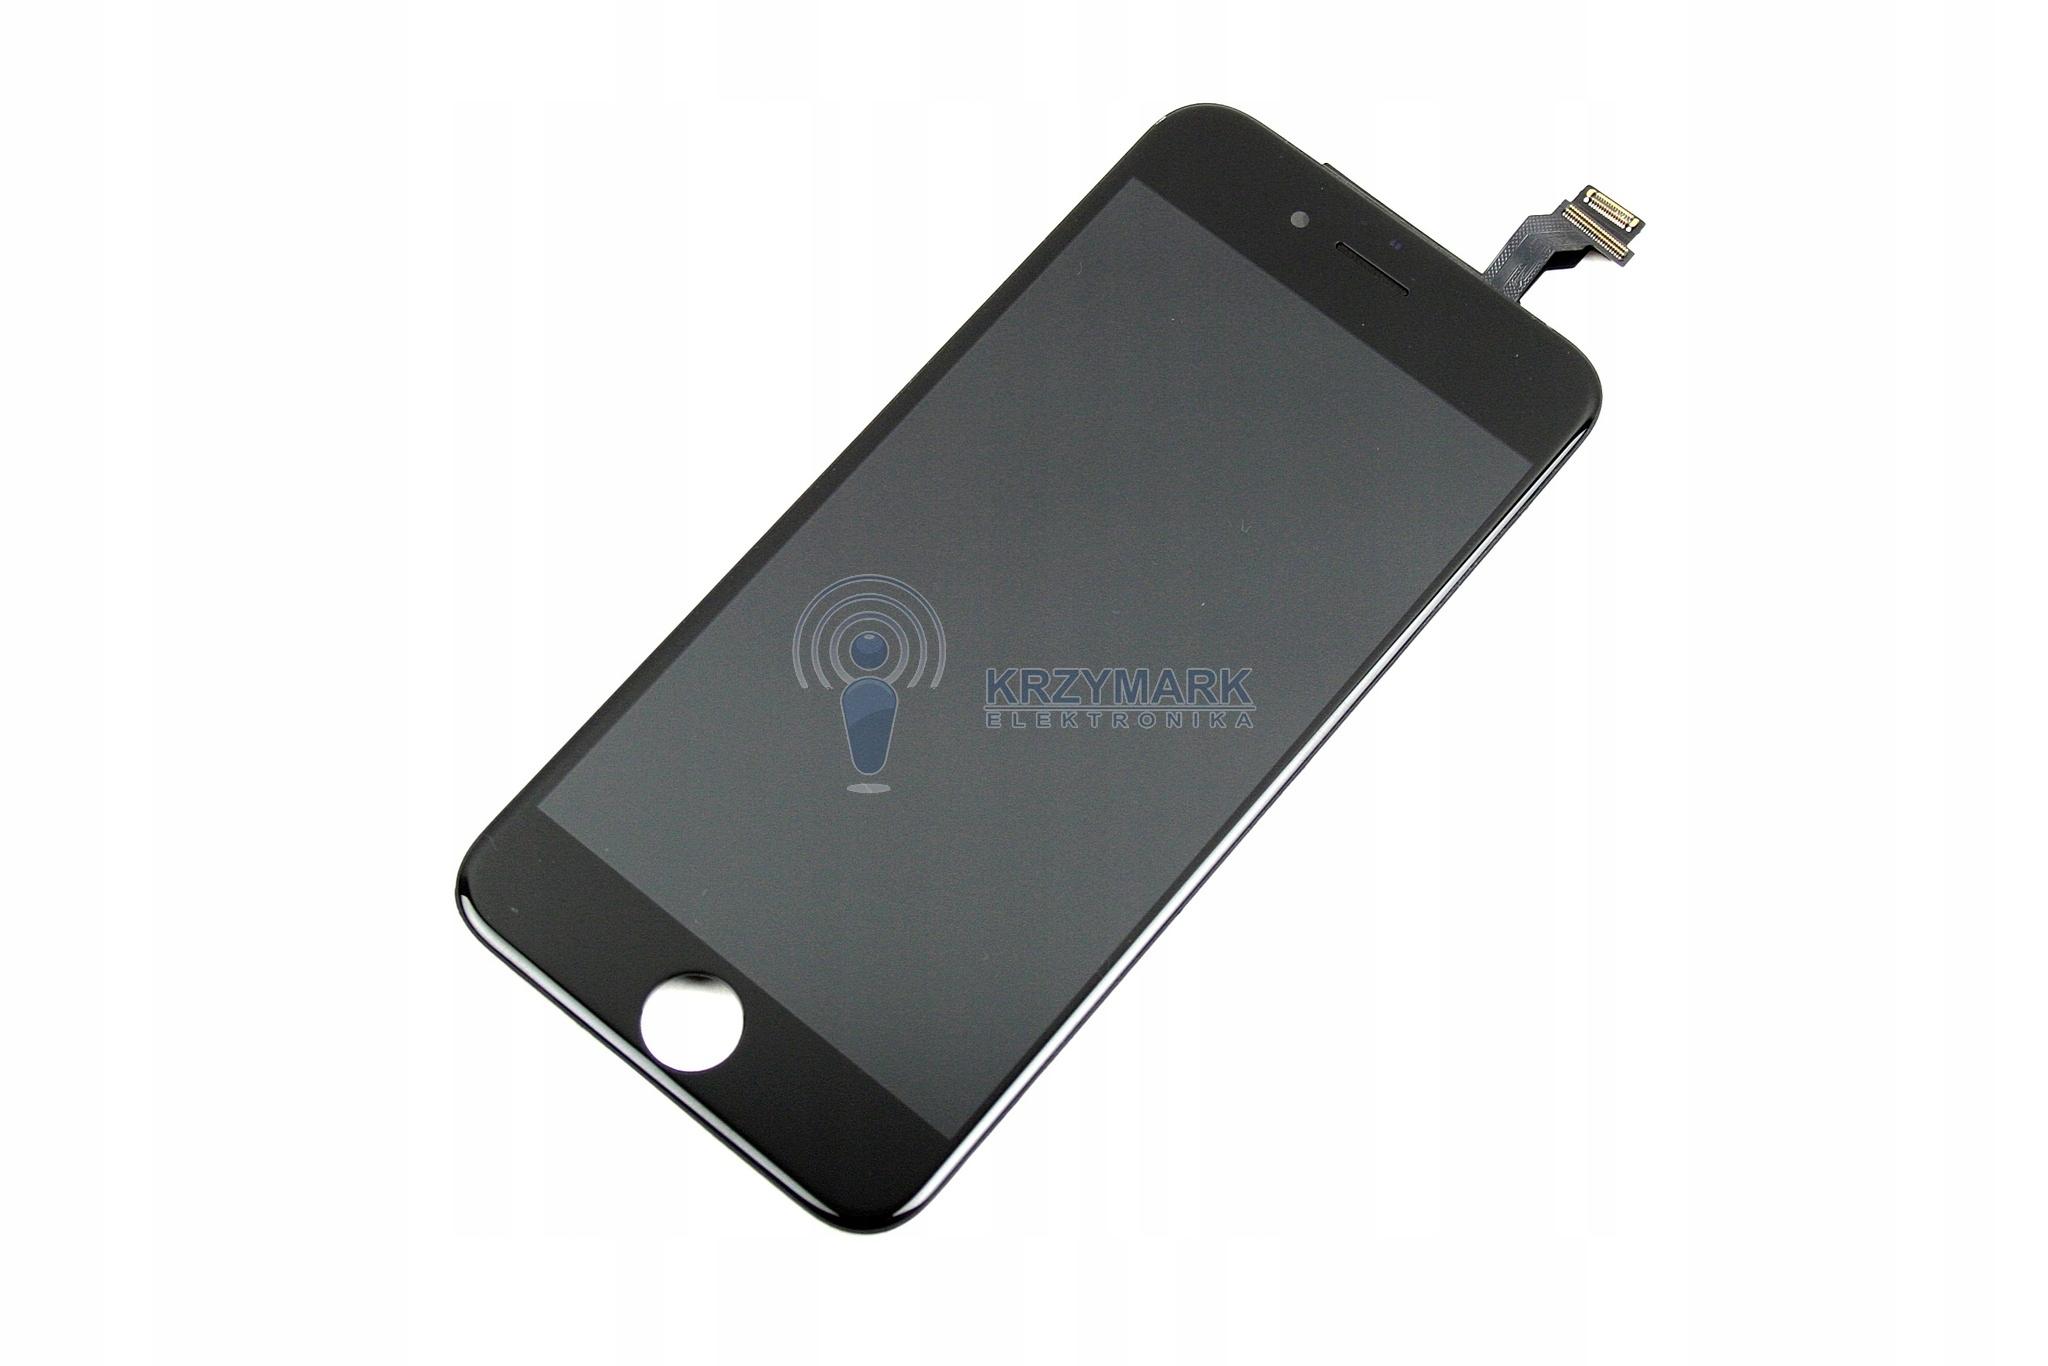 LCD EKRAN WYŚWIETLACZ APPLE IPHONE 6 DOTYK RAMKA